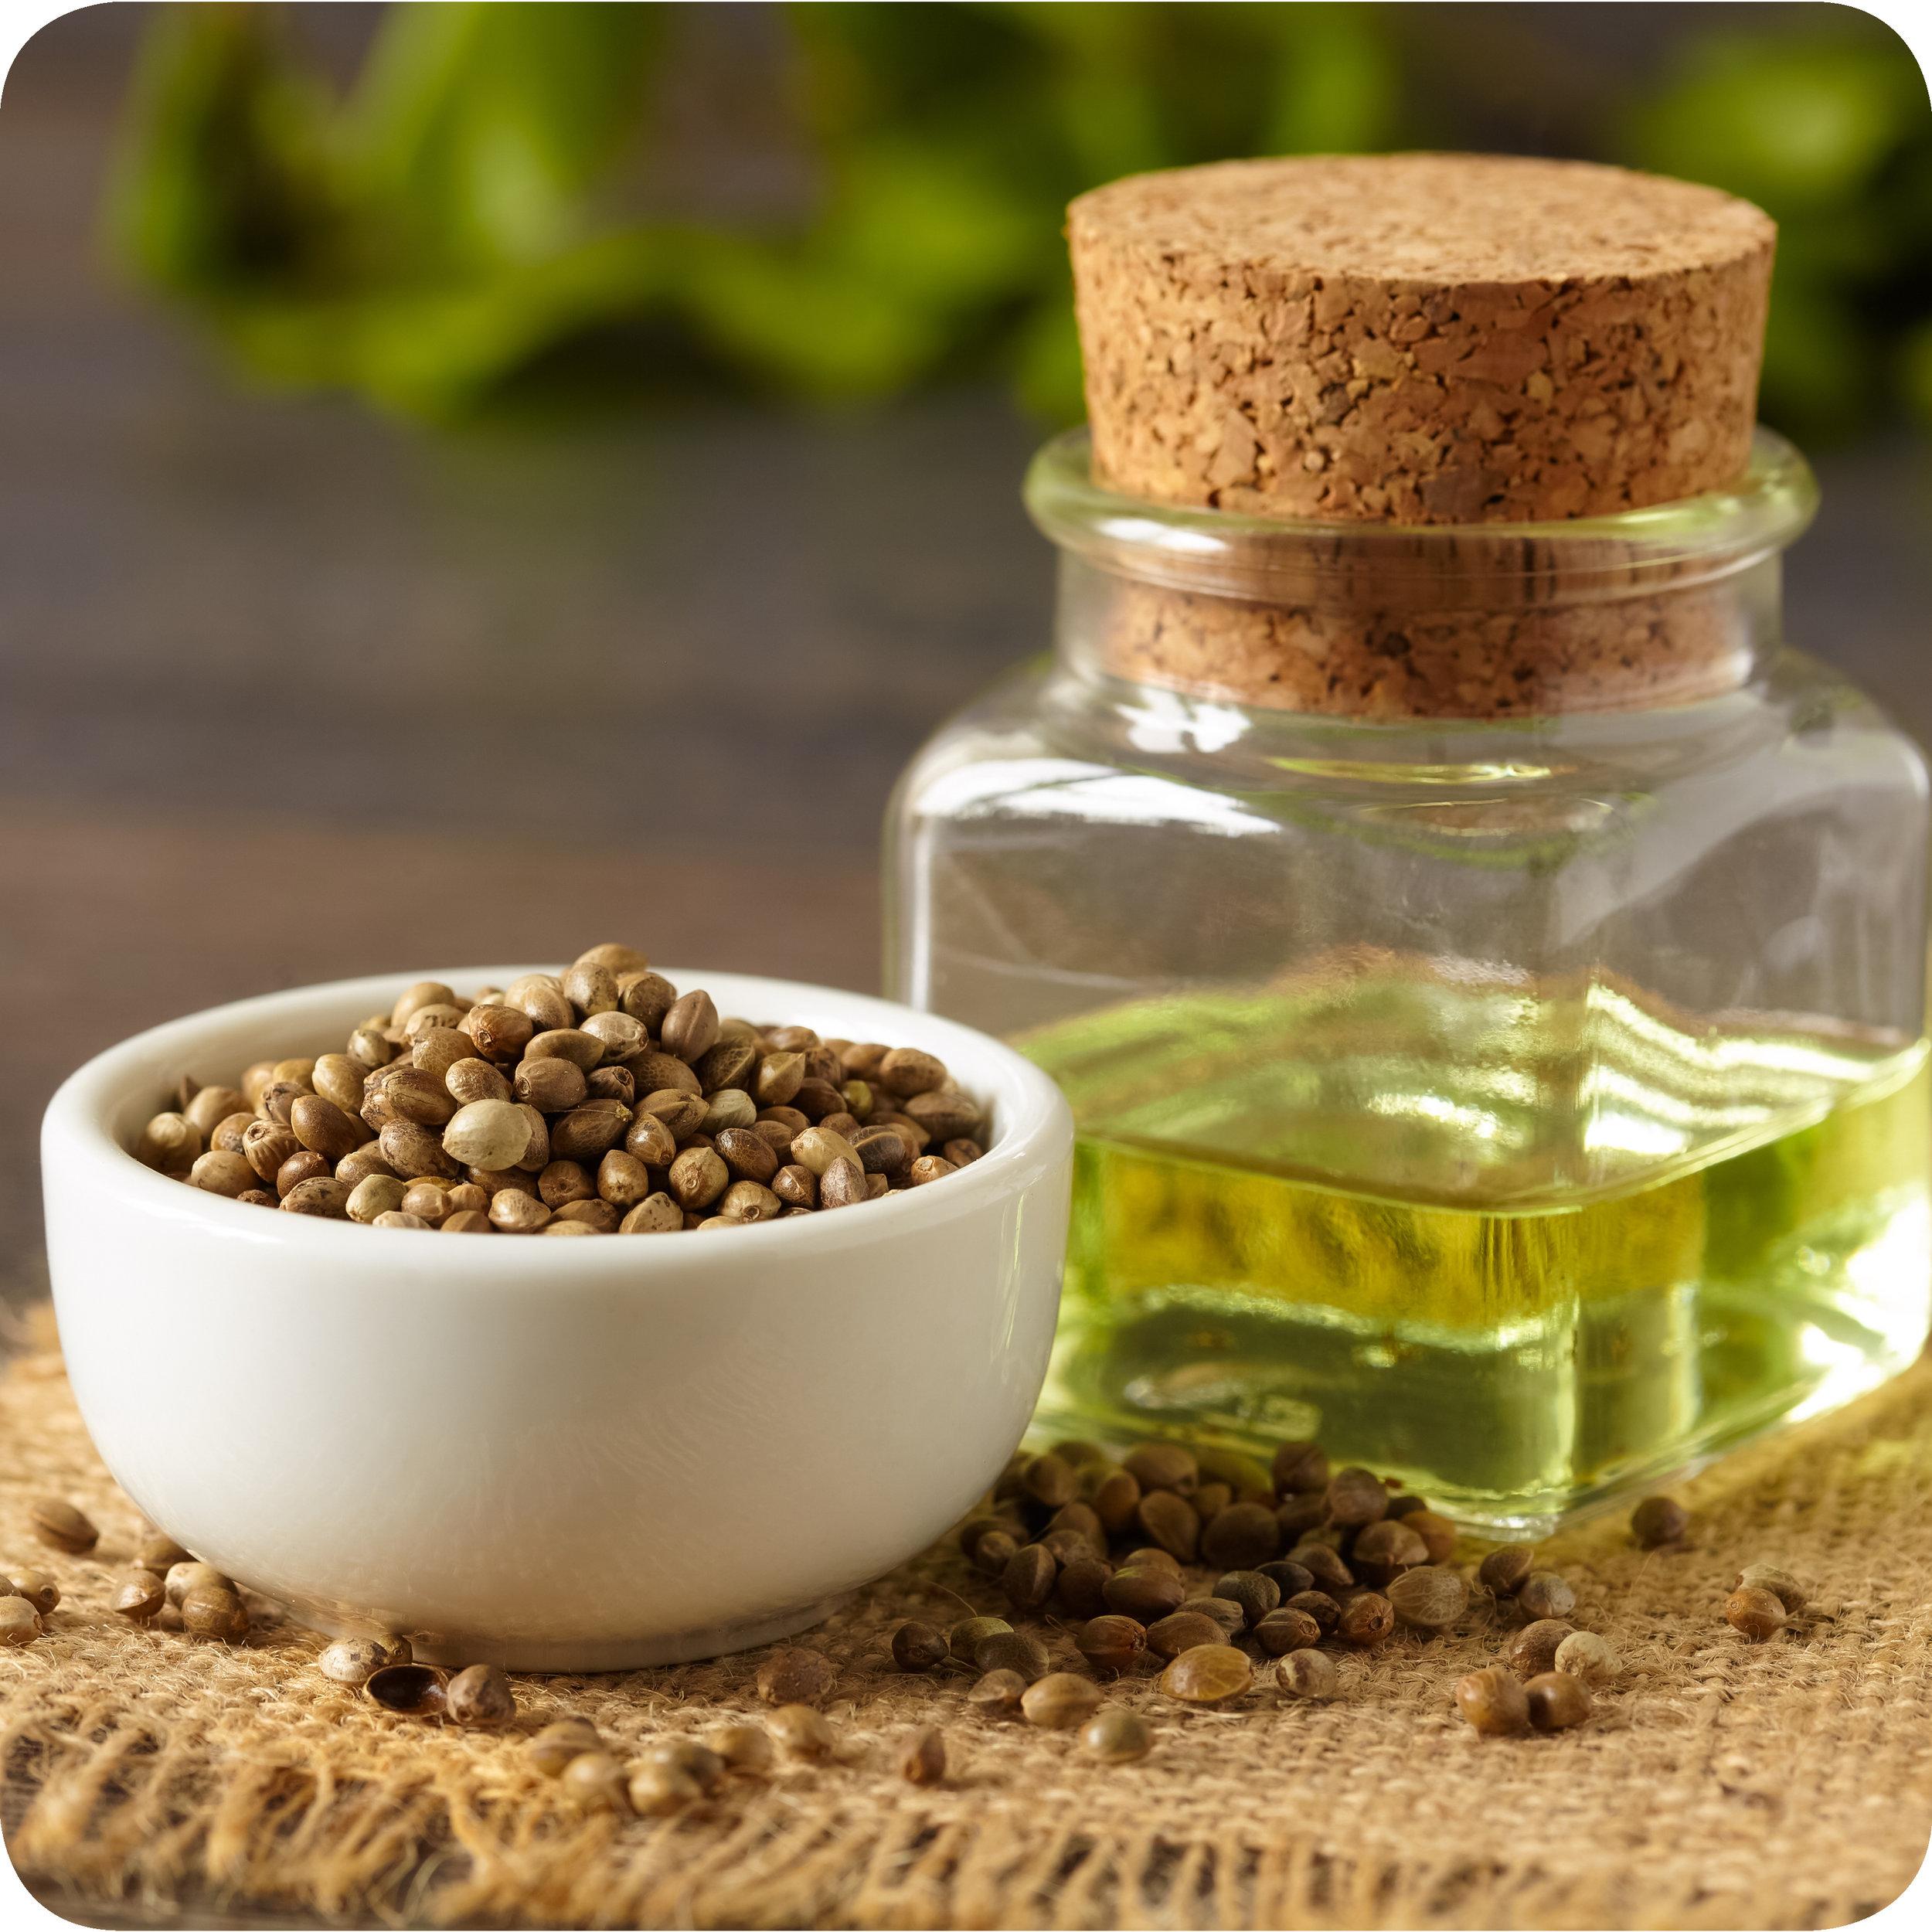 Dried hemp seeds and hemp seed oil.